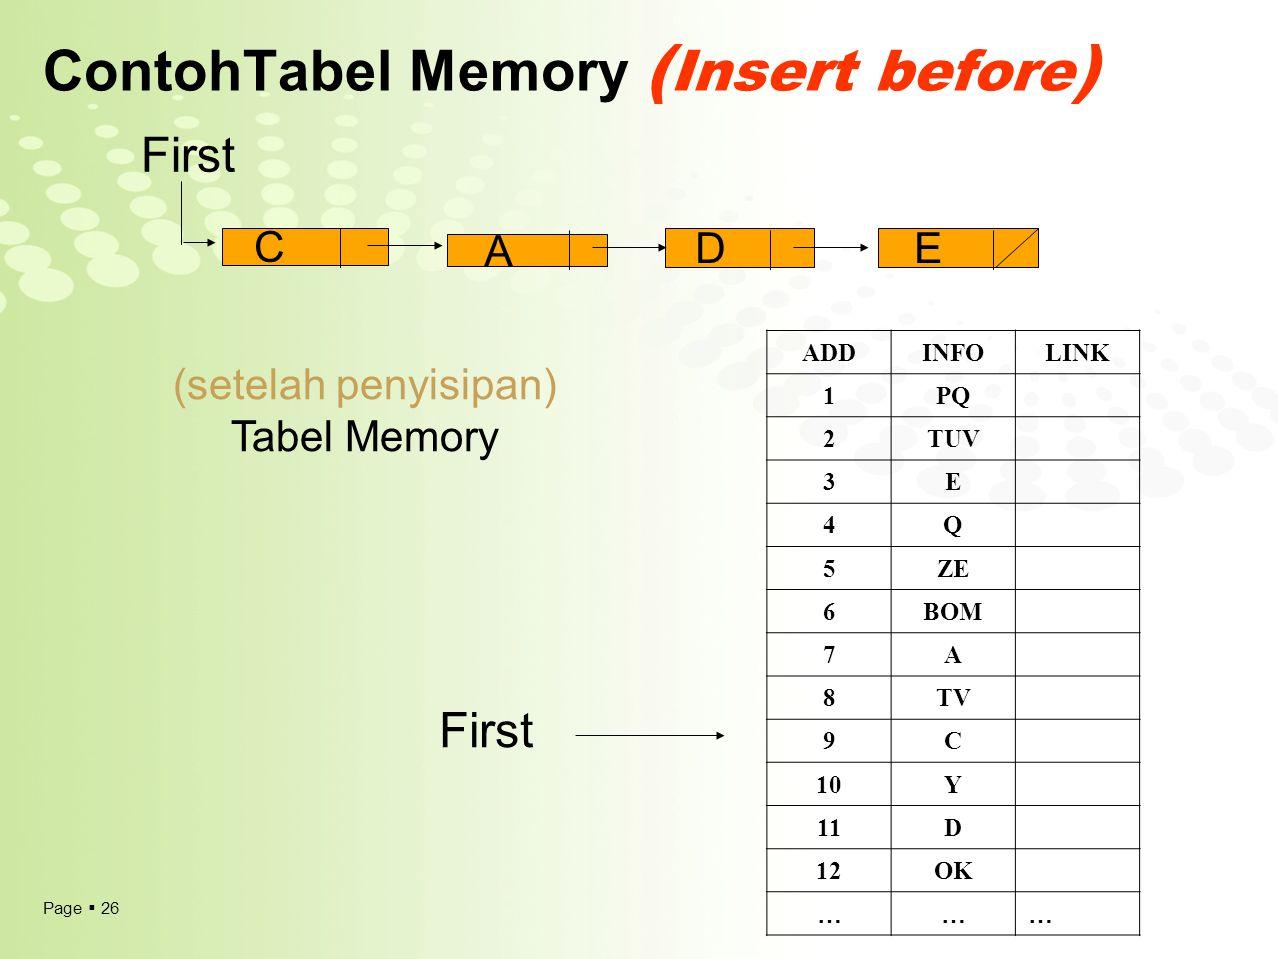 ContohTabel Memory (Insert before)